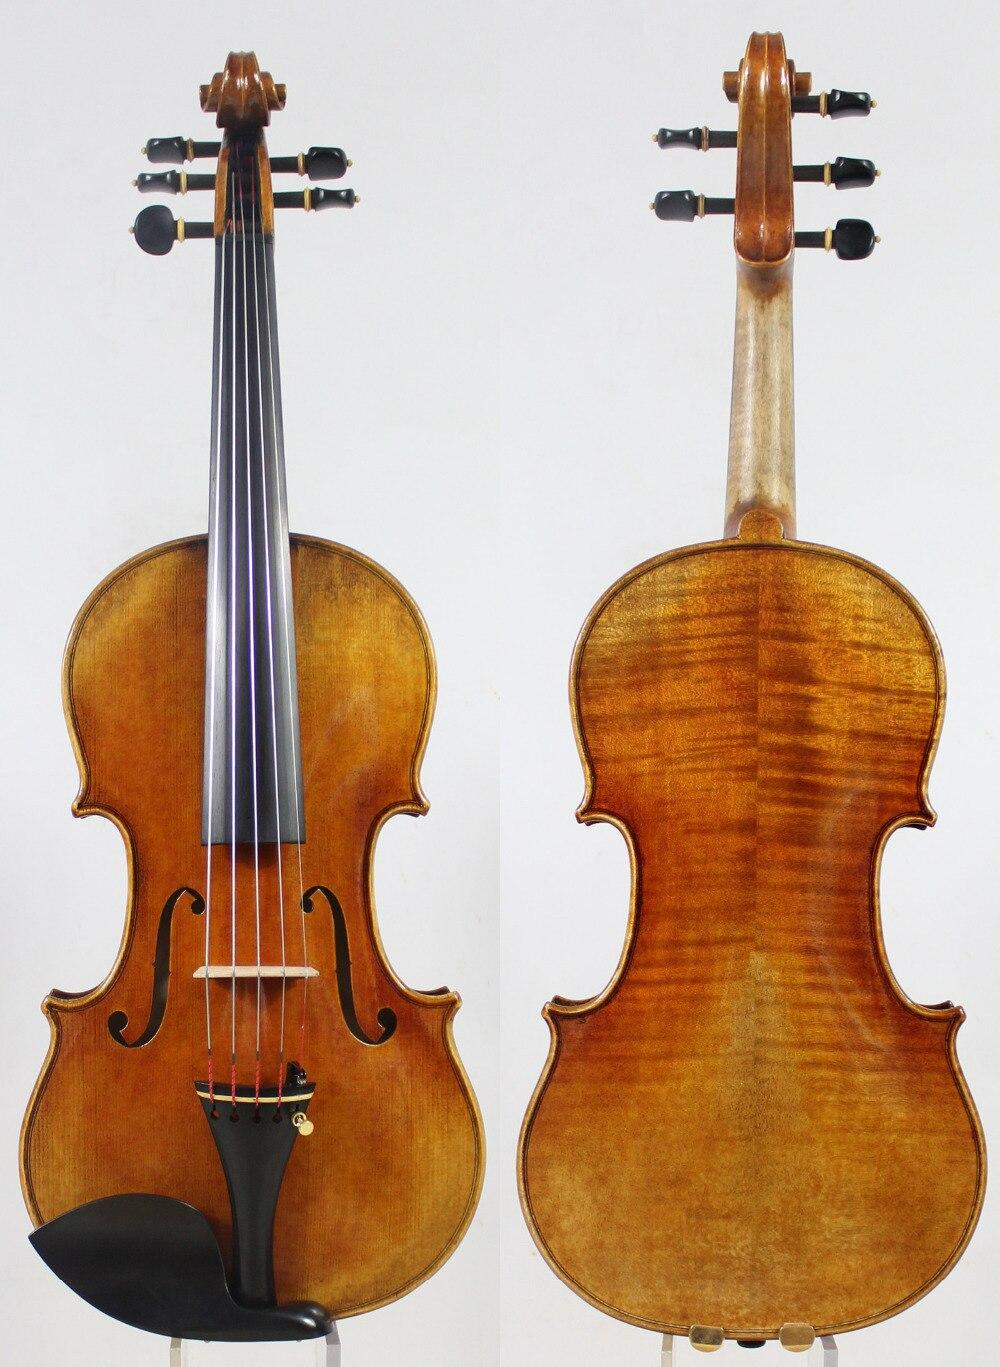 5 Strings Violin violino!Copy Stradivari 1715 Model! Antiqued oil vamish.Master Tone!Case Bow Rosin!Free Shipping!Aubert Bridge! antique violin model stradivarius 1715 model 100